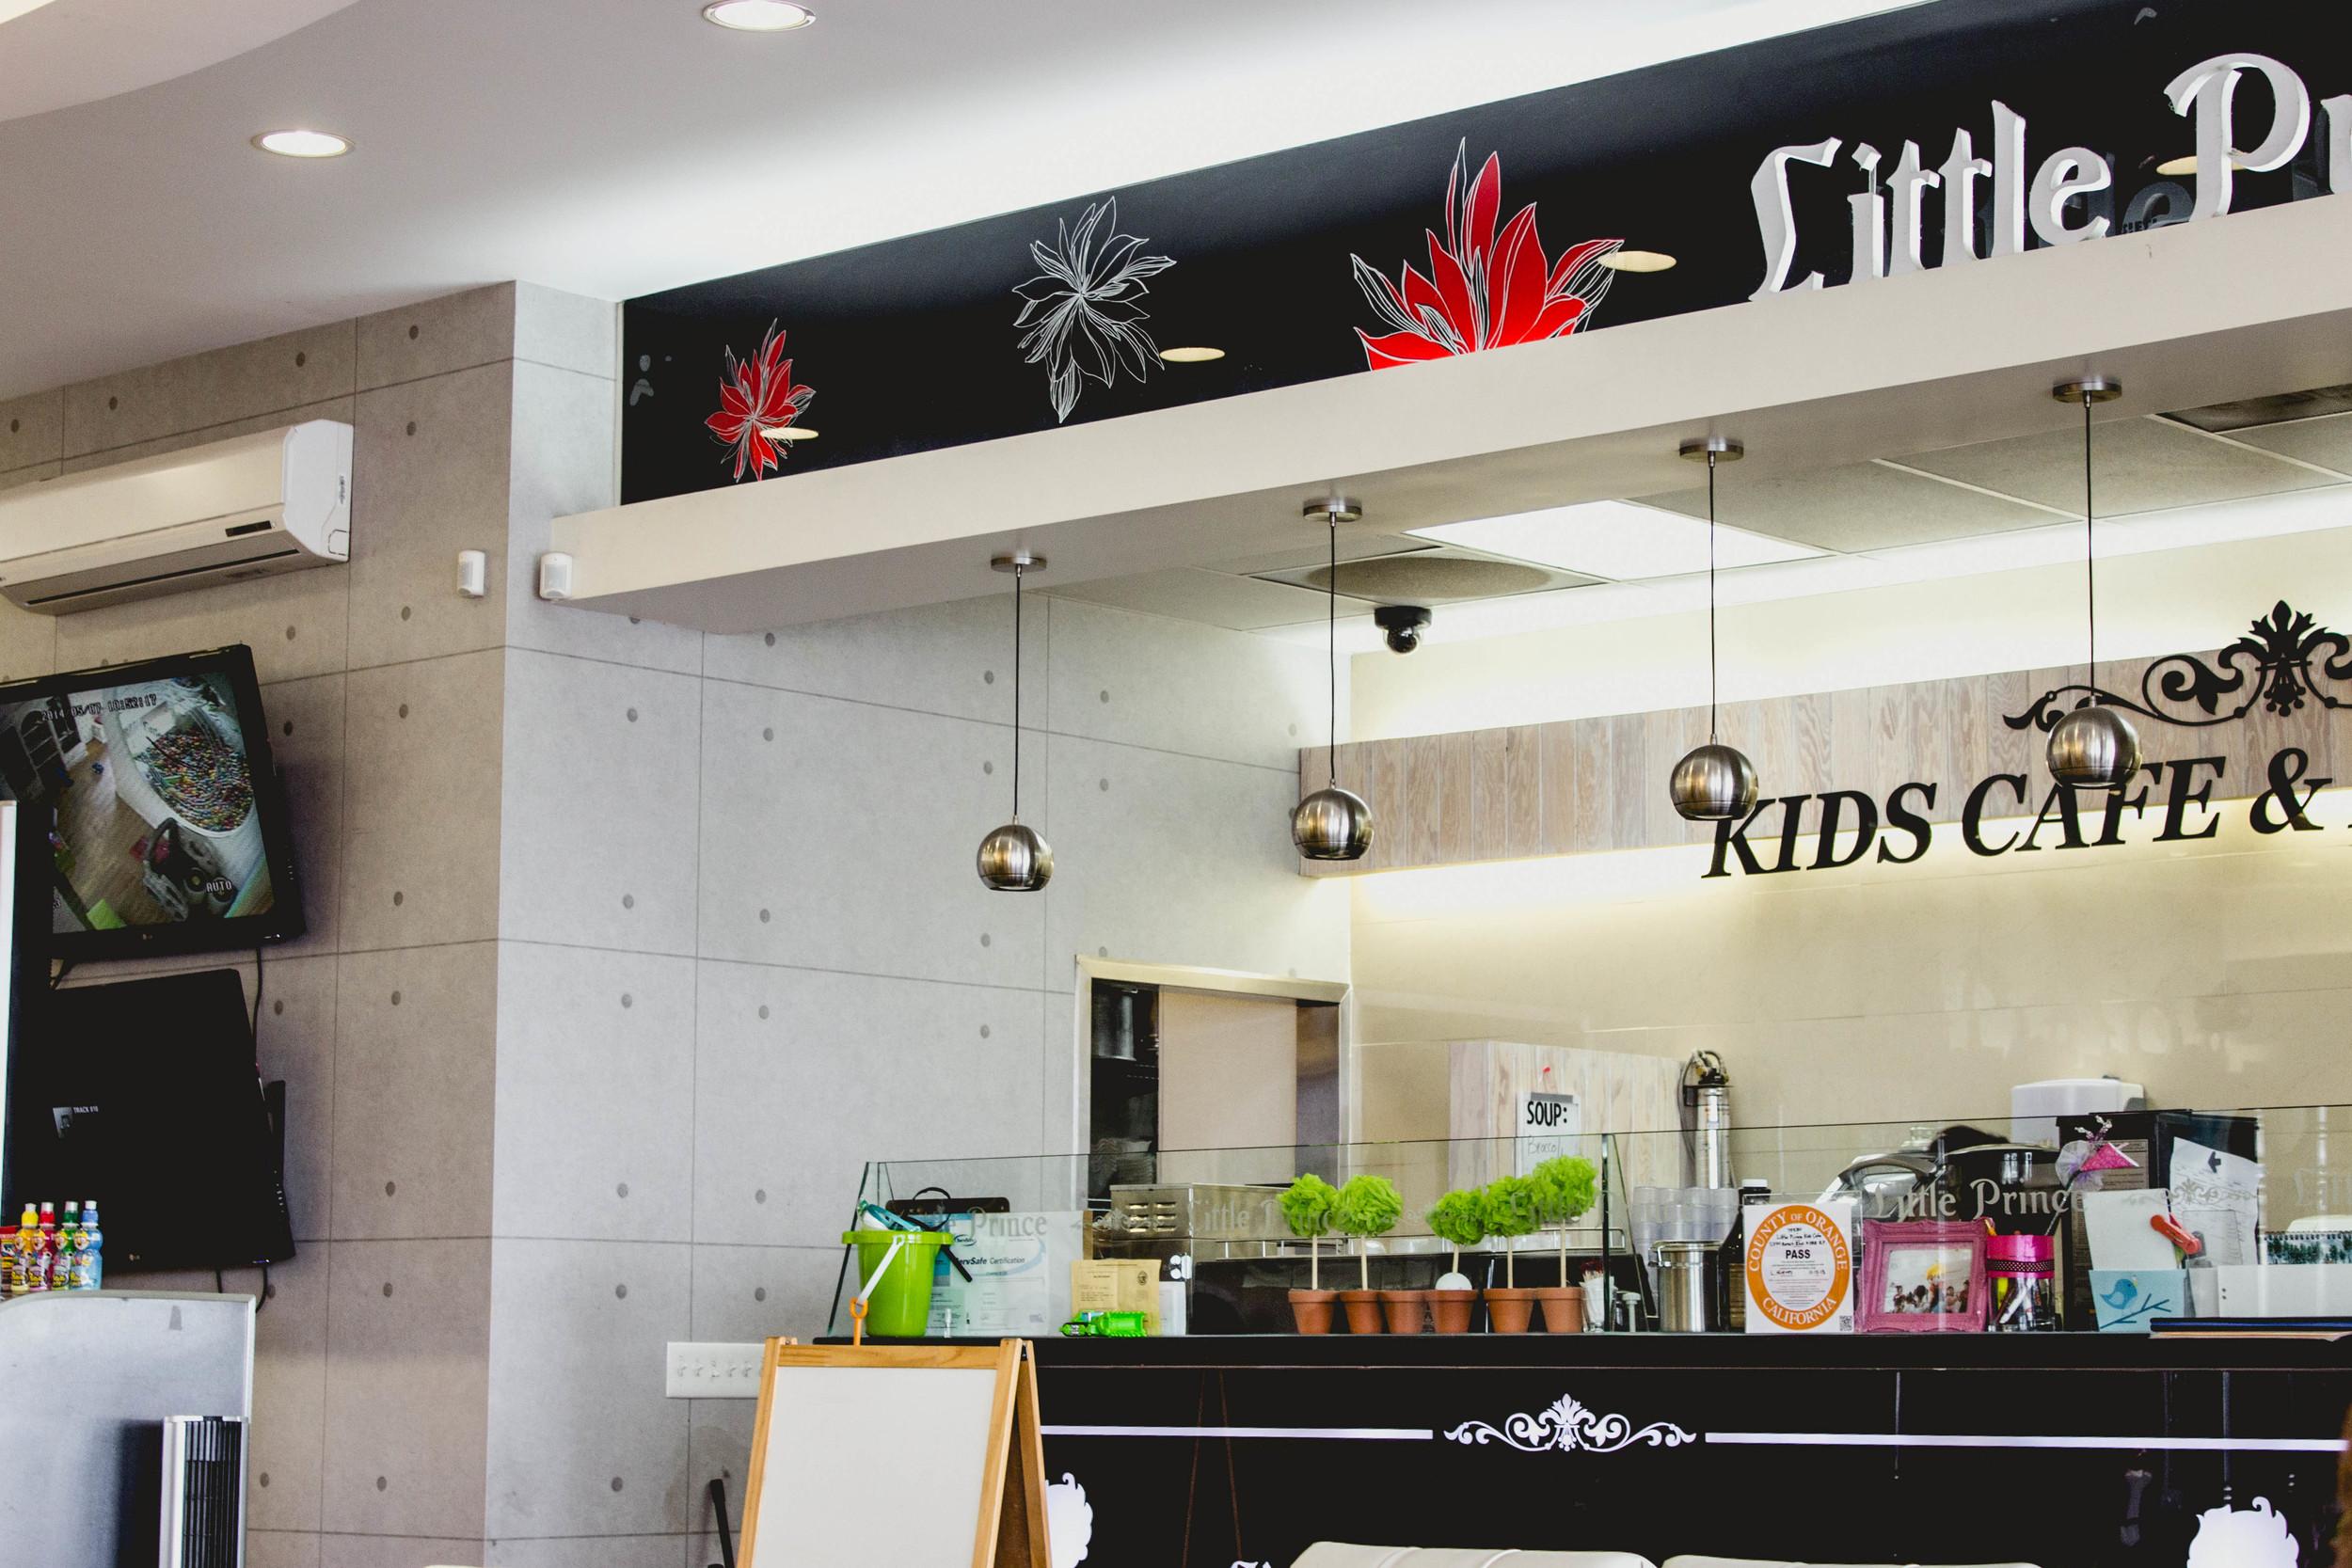 Little Prince Kids Cafe Orange County